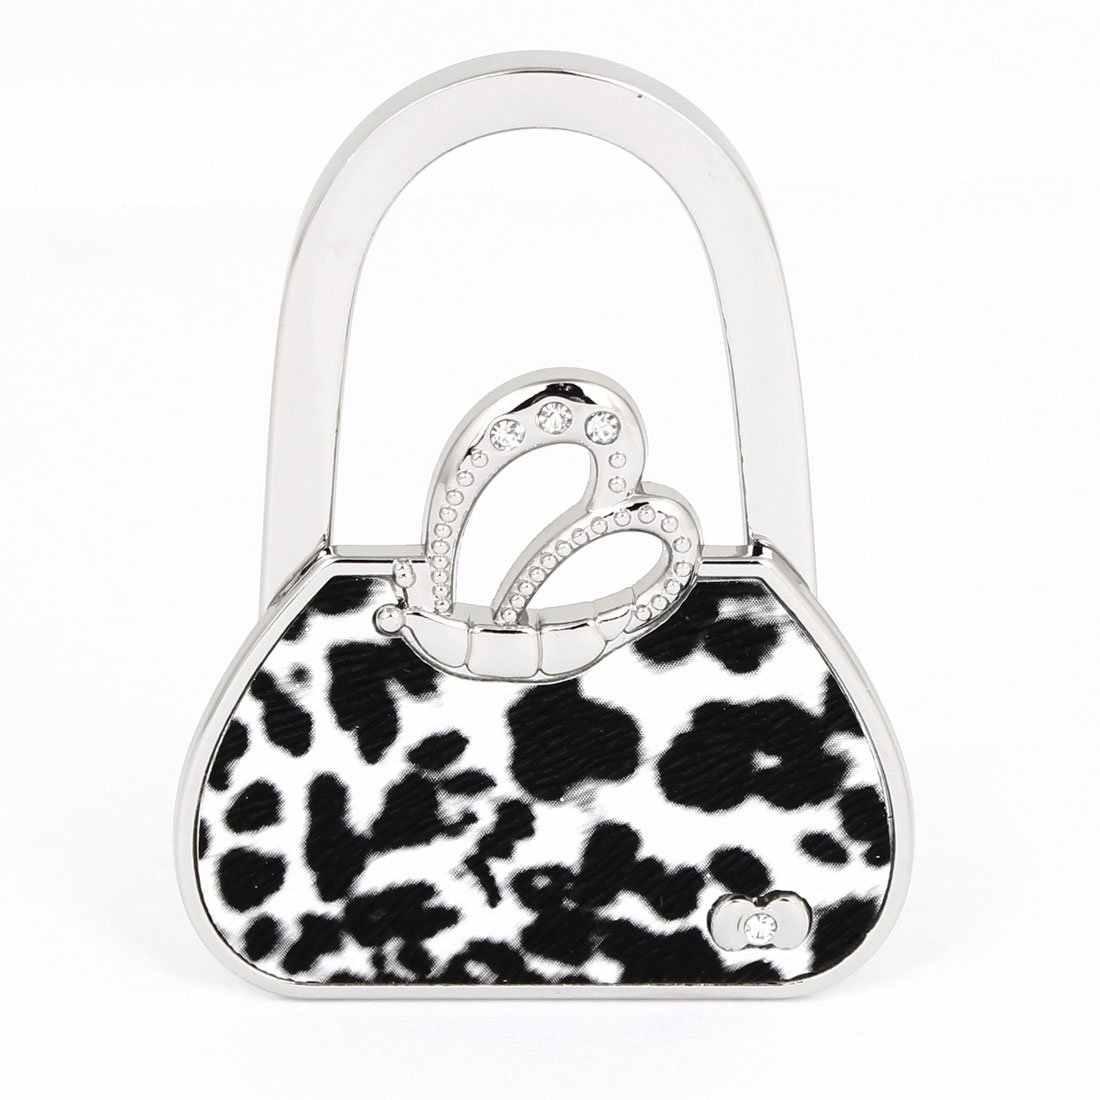 Leopard Print Handbag Table Hook Hanger